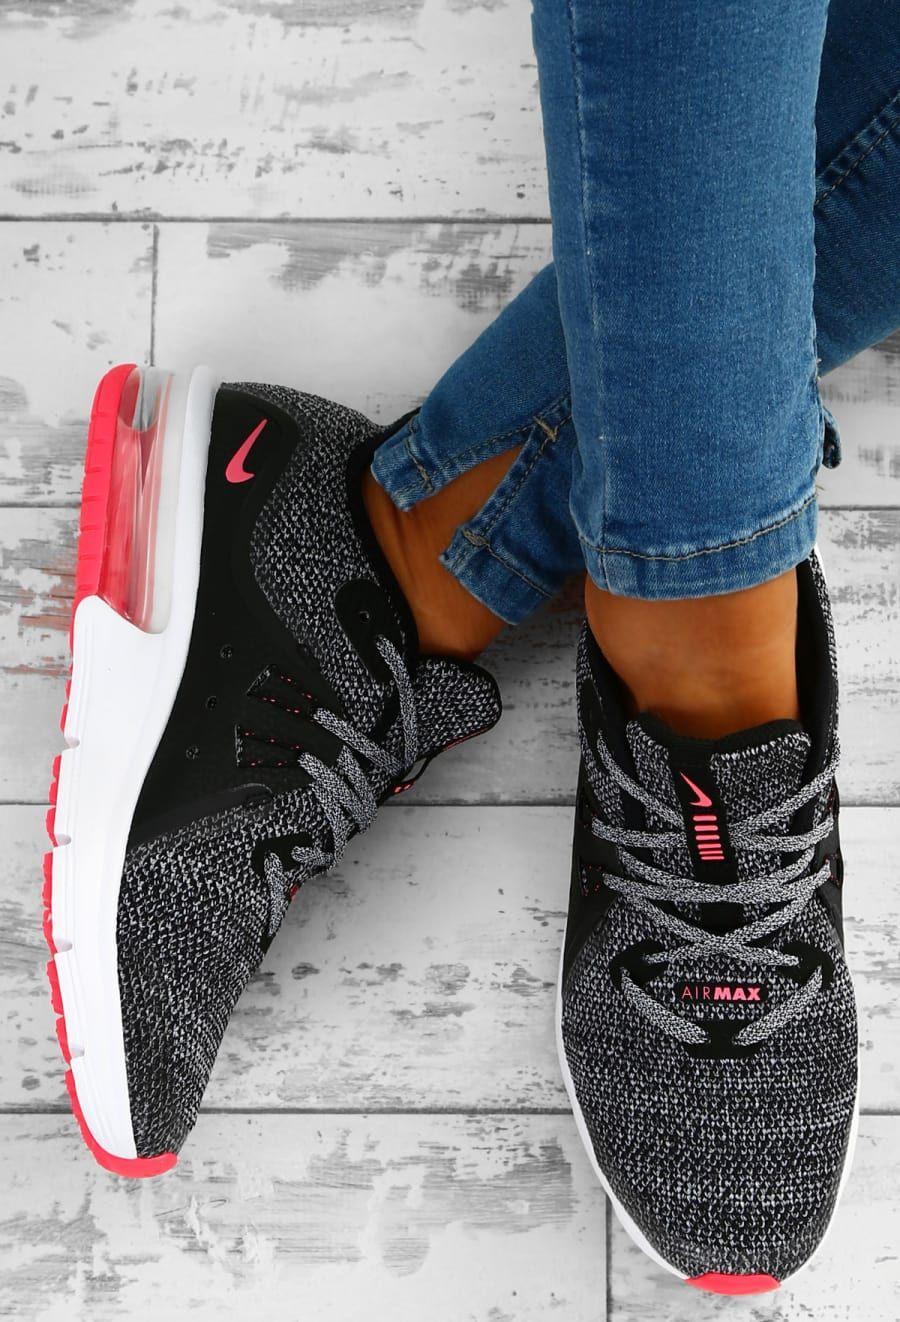 223a74714f Nike Air Max Sequent 3 Monochrome Knitted Trainers | Fresh Kicks ...